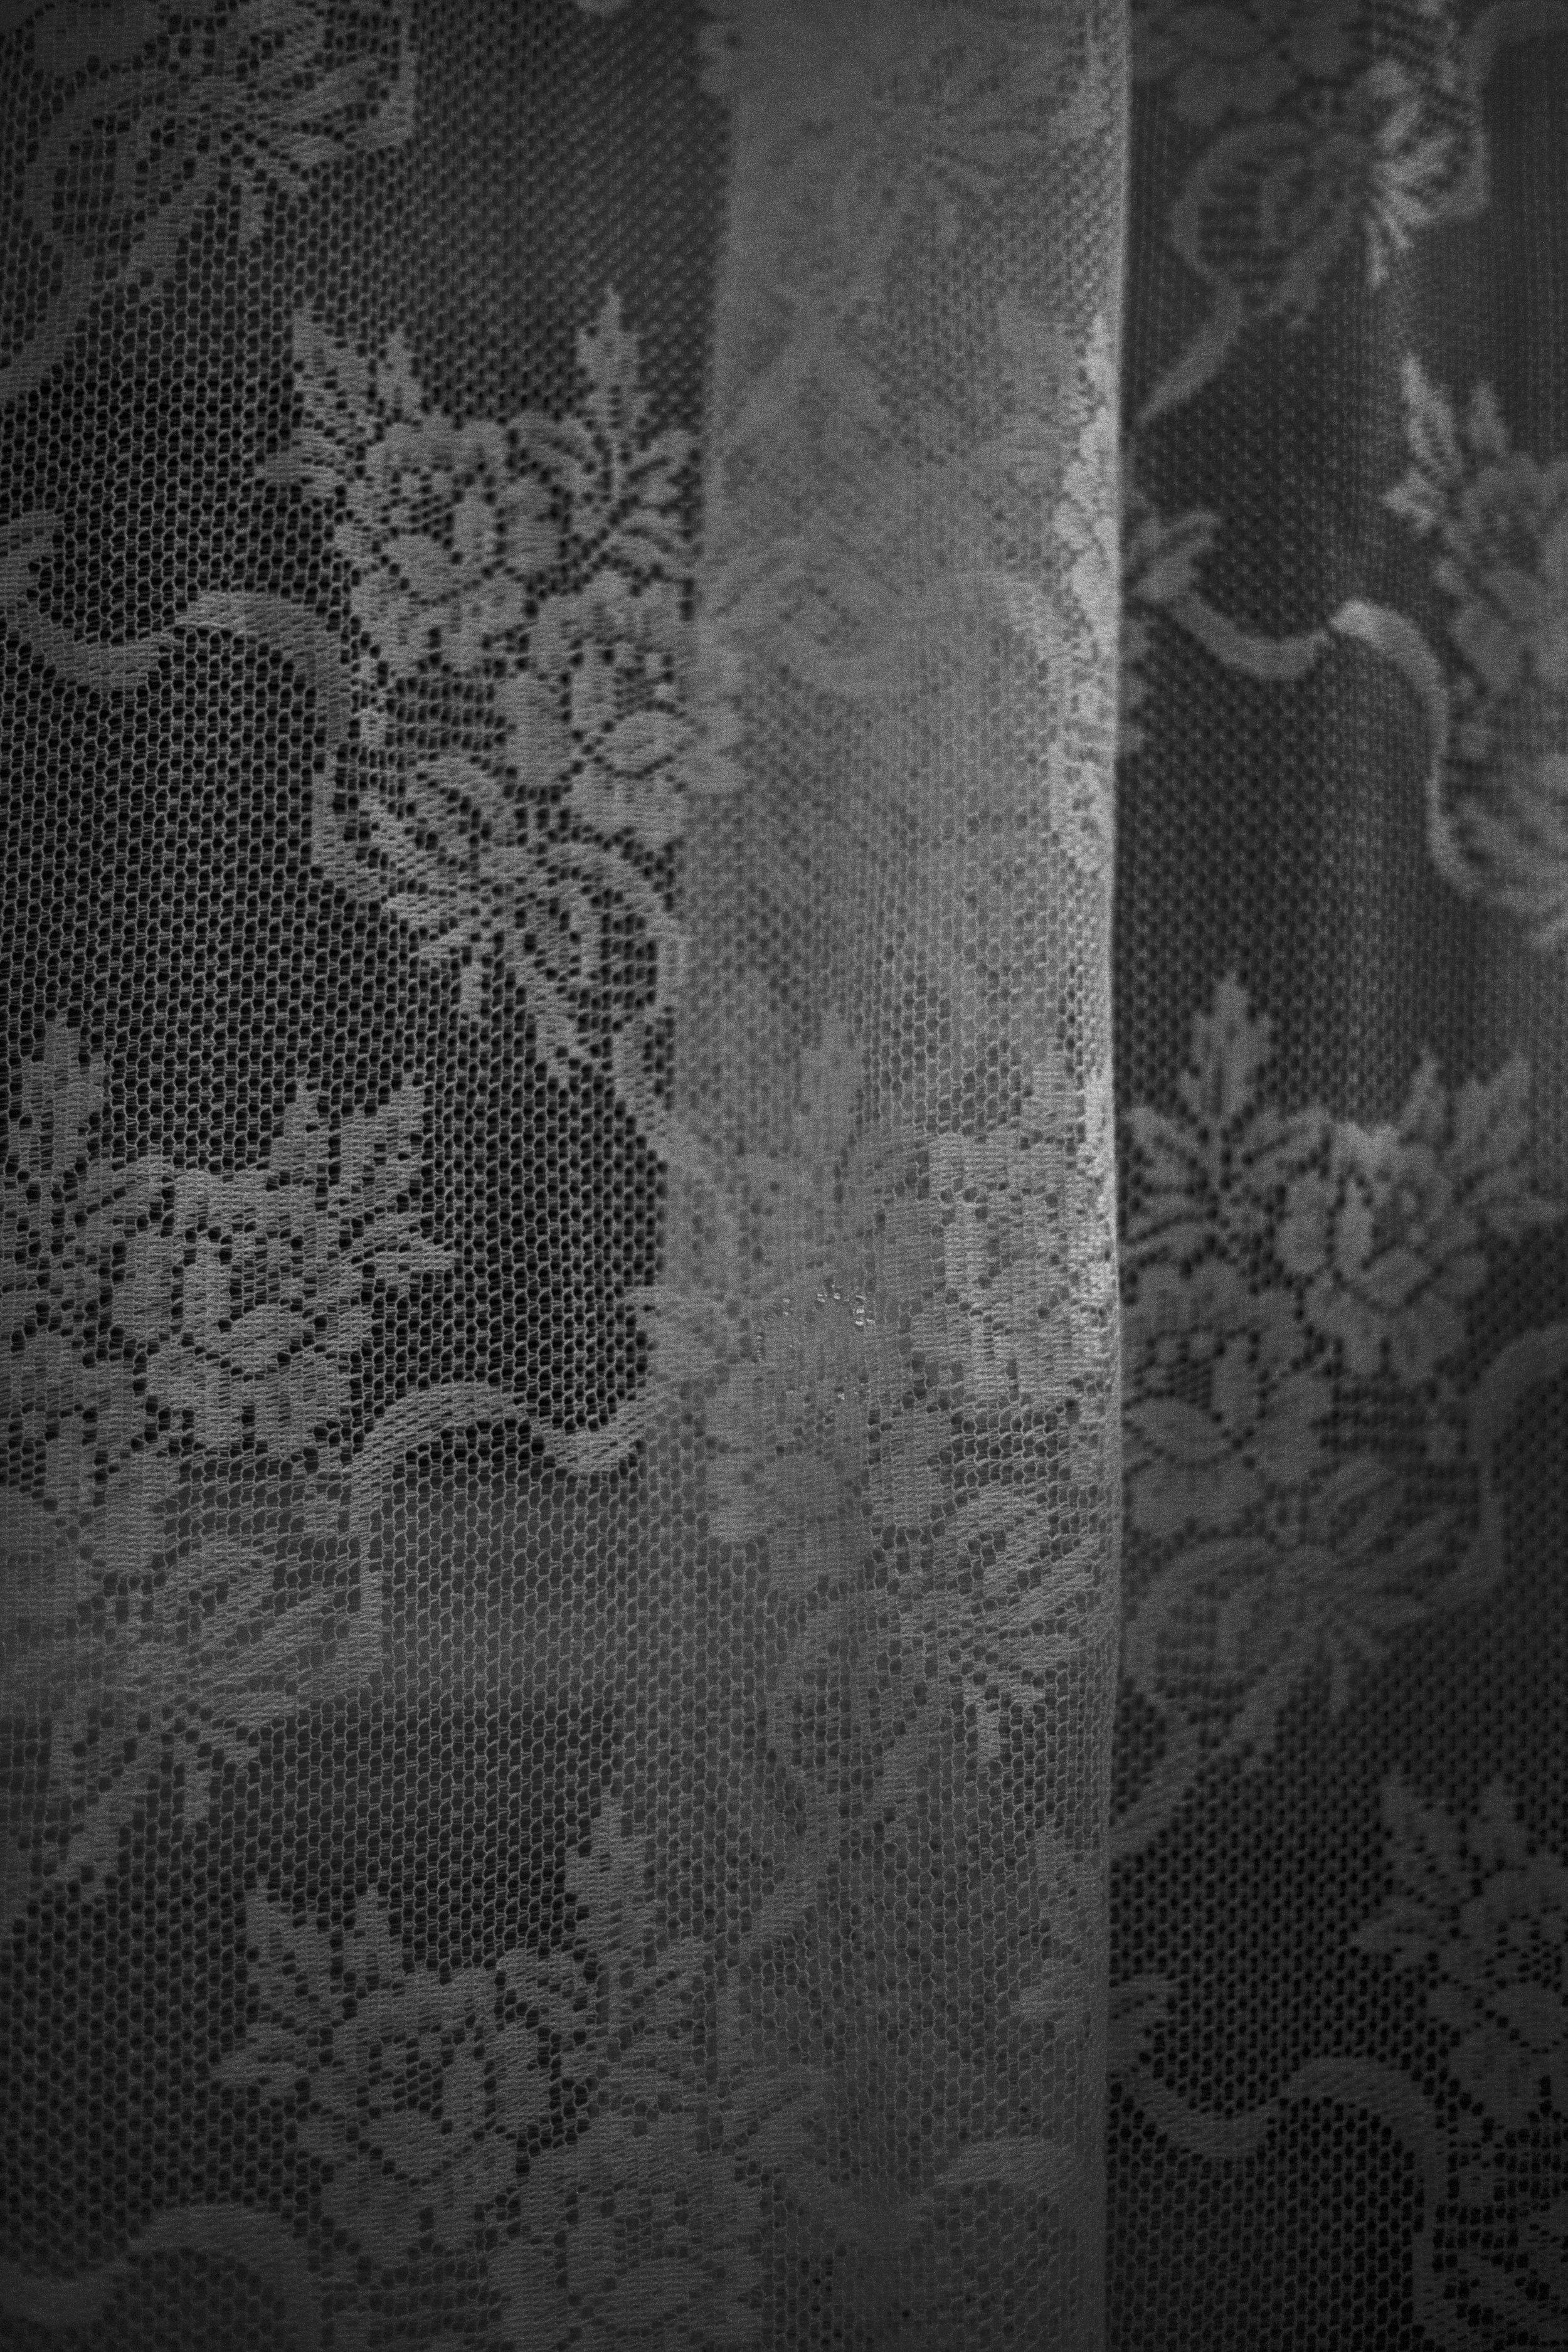 flower curtains 002.jpg